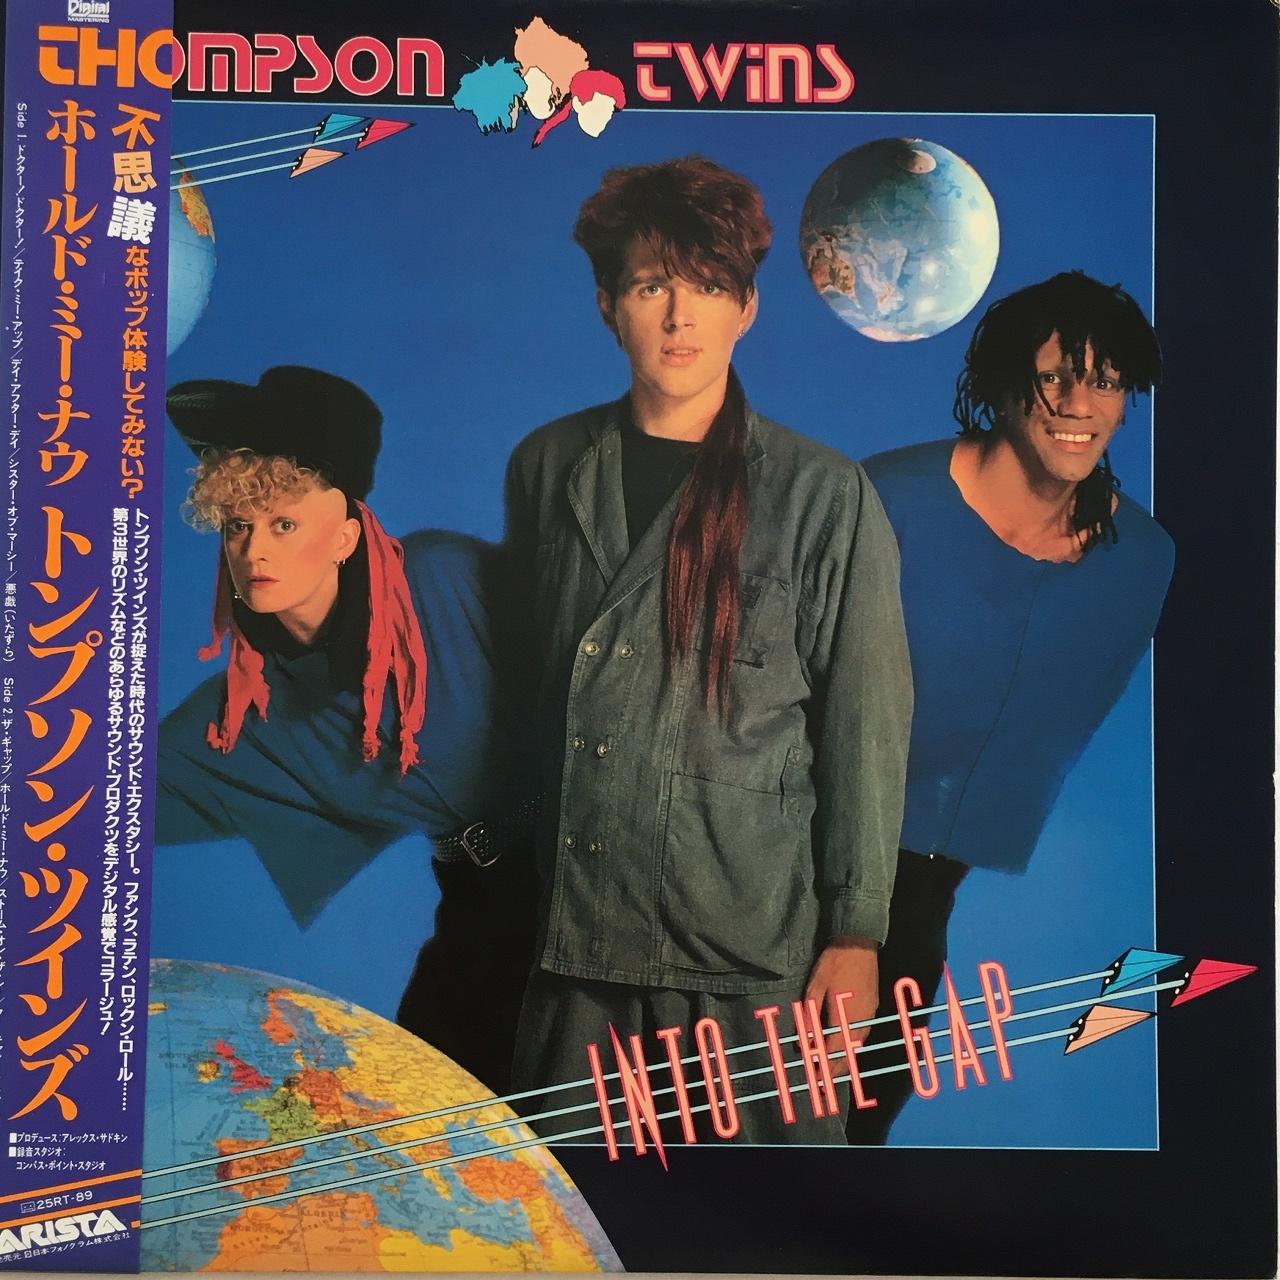 【LP・国内盤】トンプソン・ツインズ / ホールド・ミー・ナウ